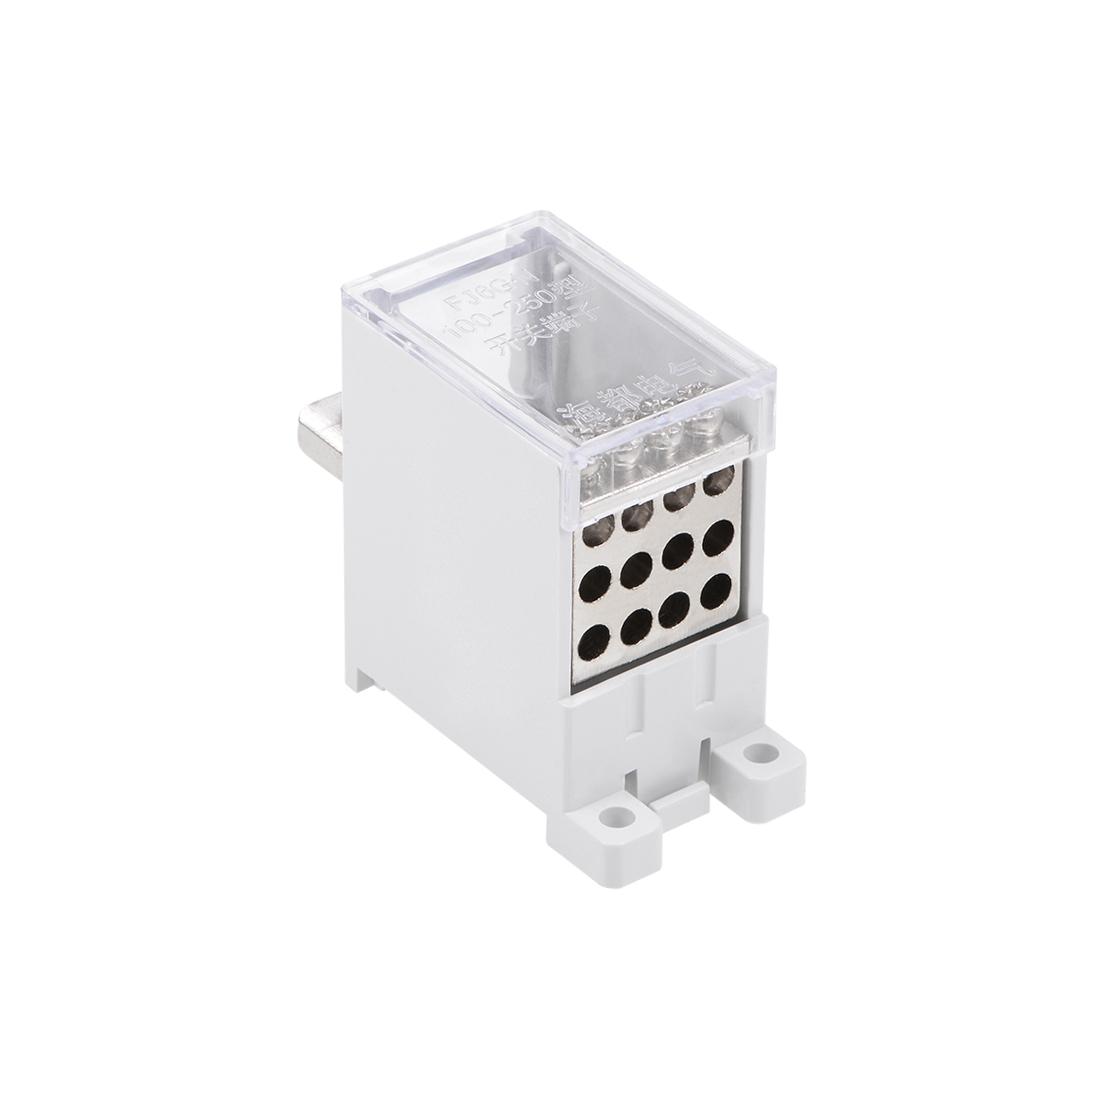 1 Inlet 12 Outlet DIN Rail Terminal Block Distribution Block for Circuit Breaker